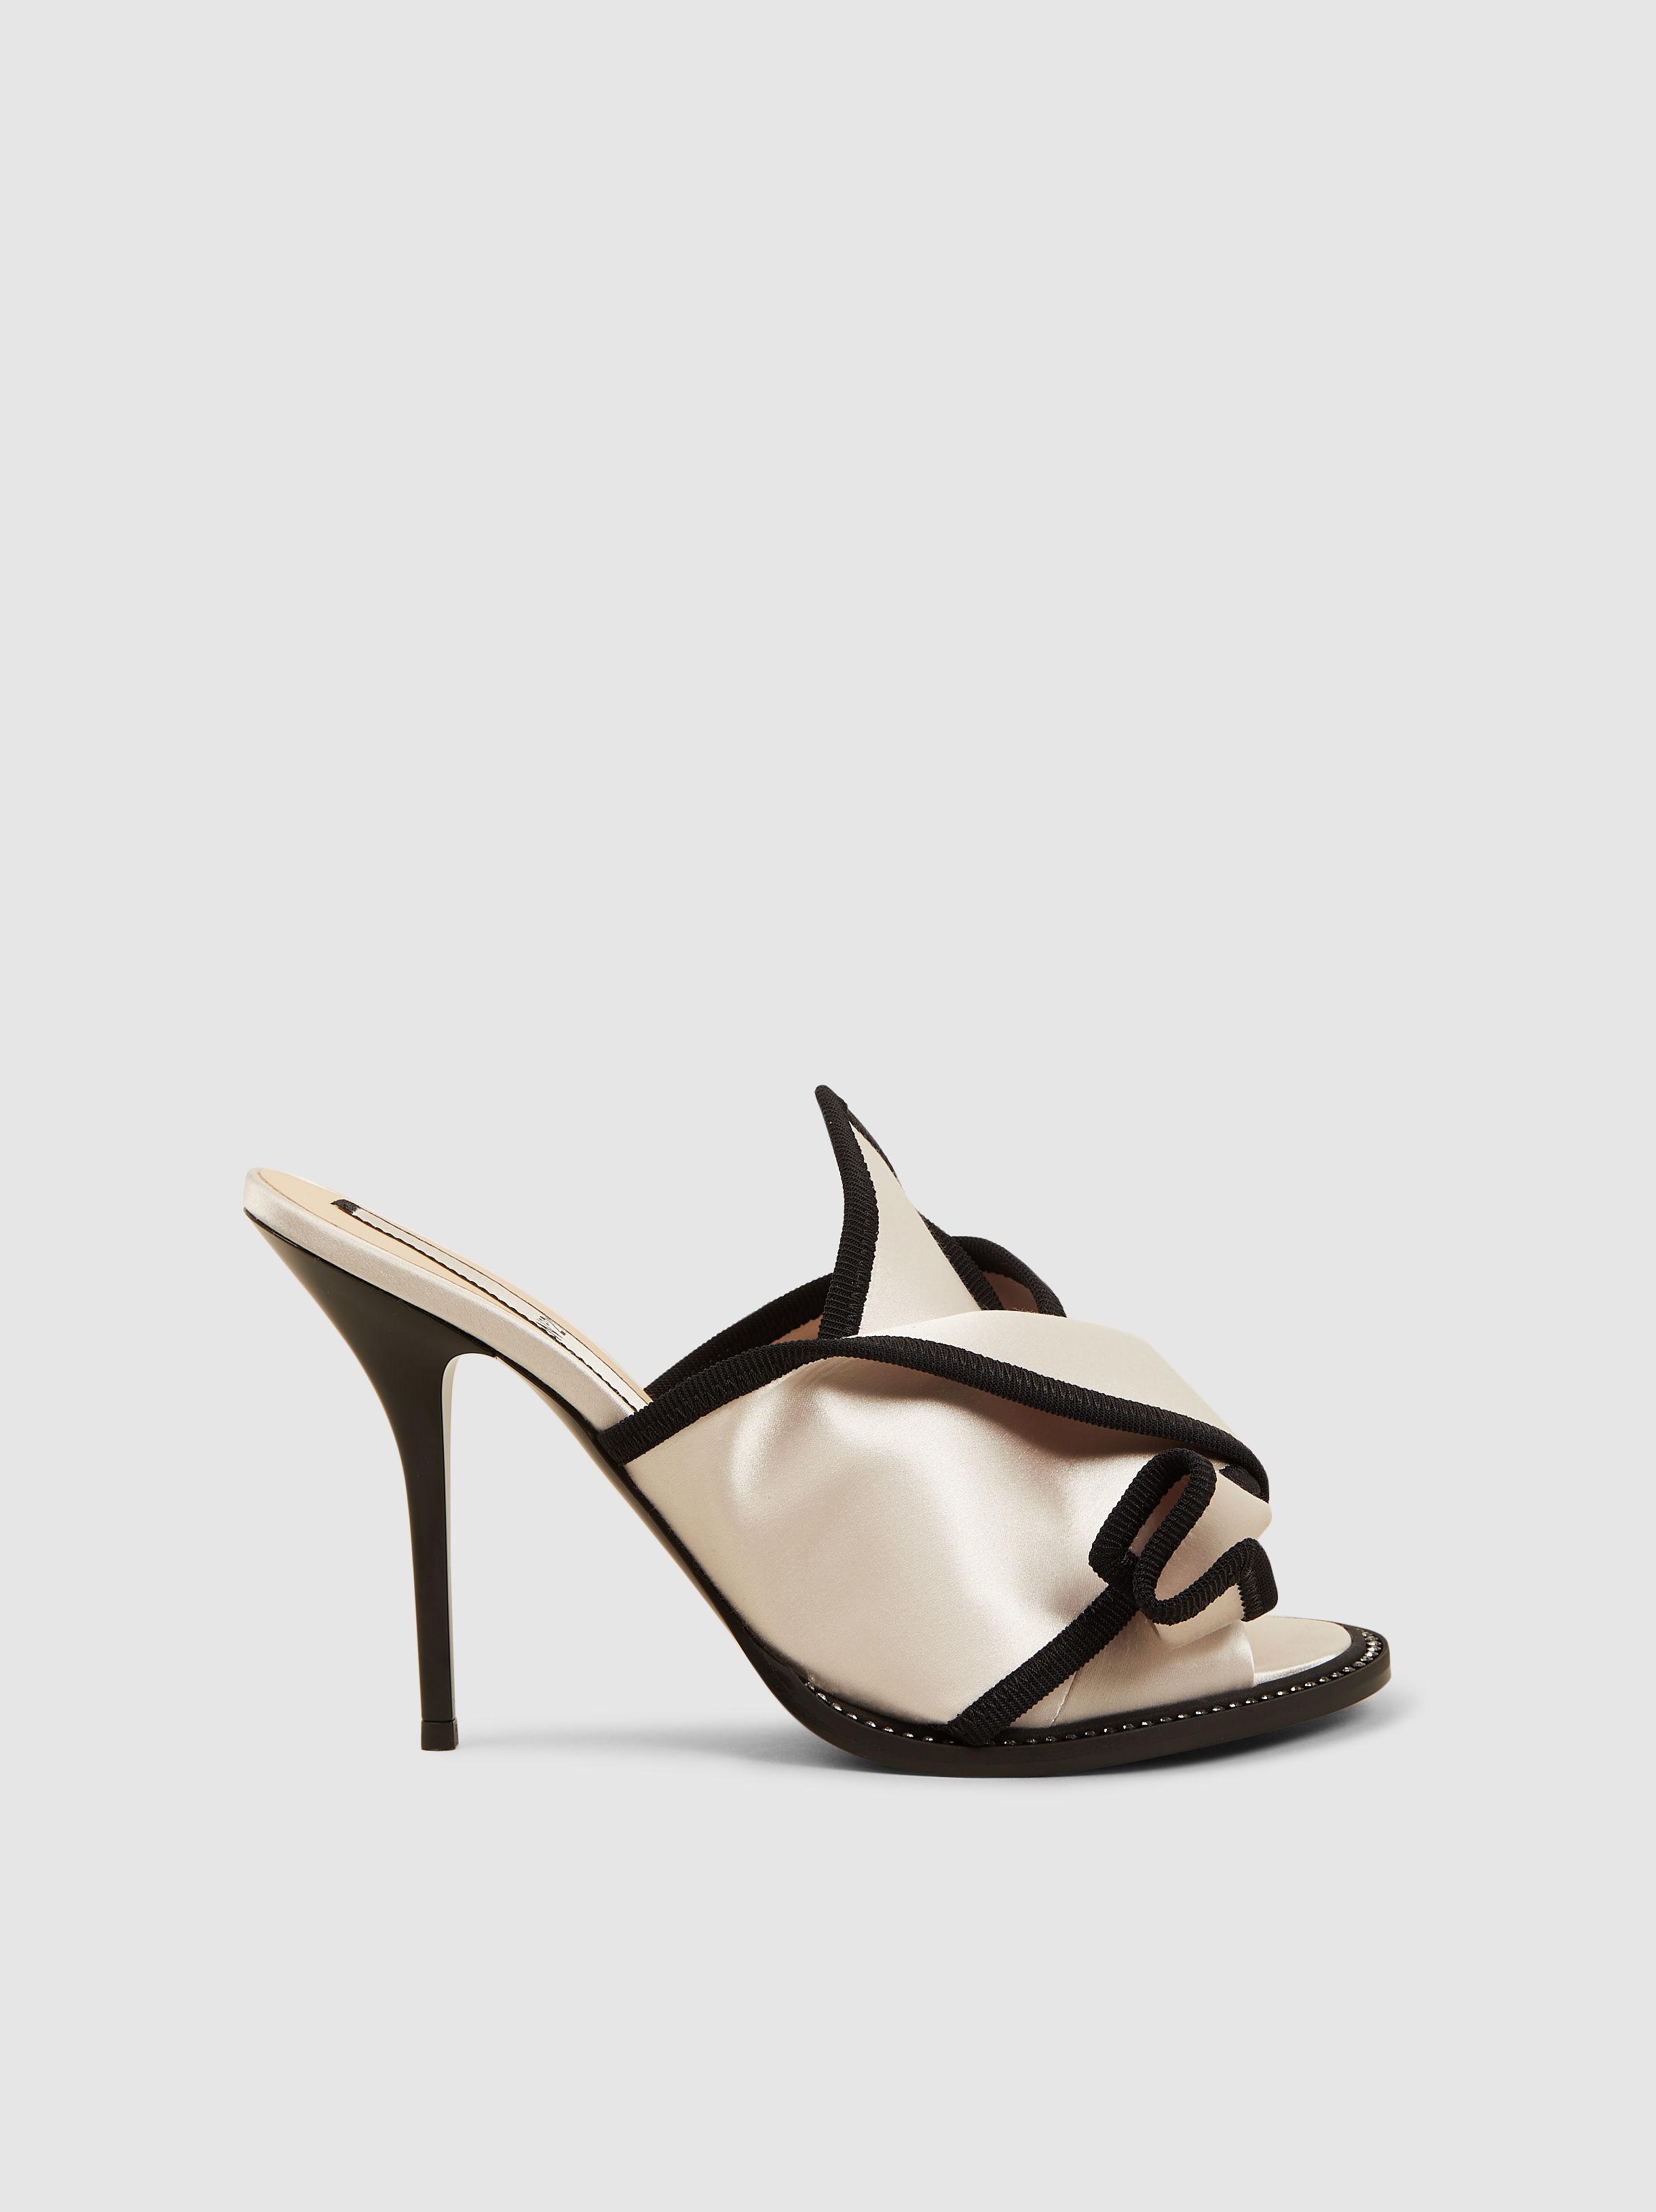 e088816d3474 ... White Bow Two-tone Satin Sandals - Lyst. View fullscreen